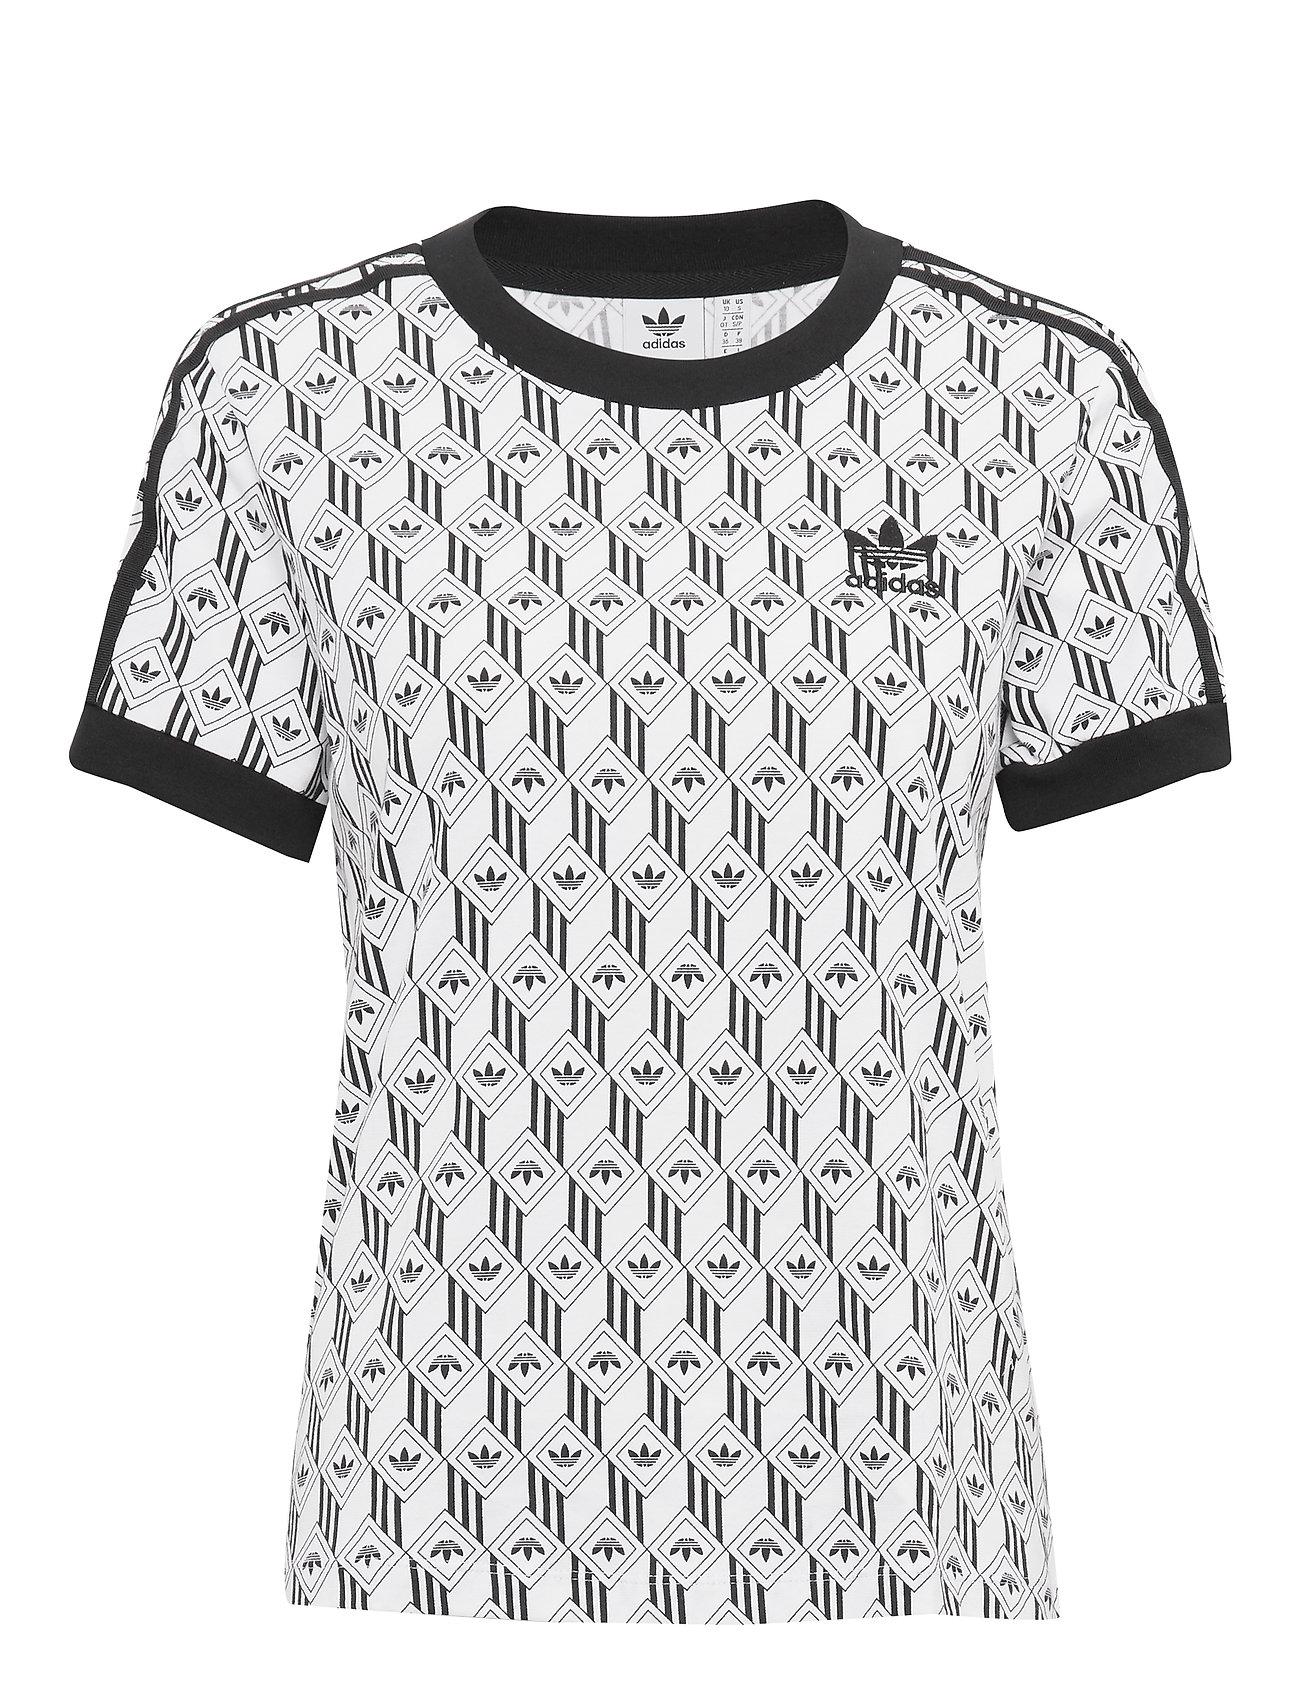 adidas Originals 3 STRIPES TEE - BLACK/WHITE